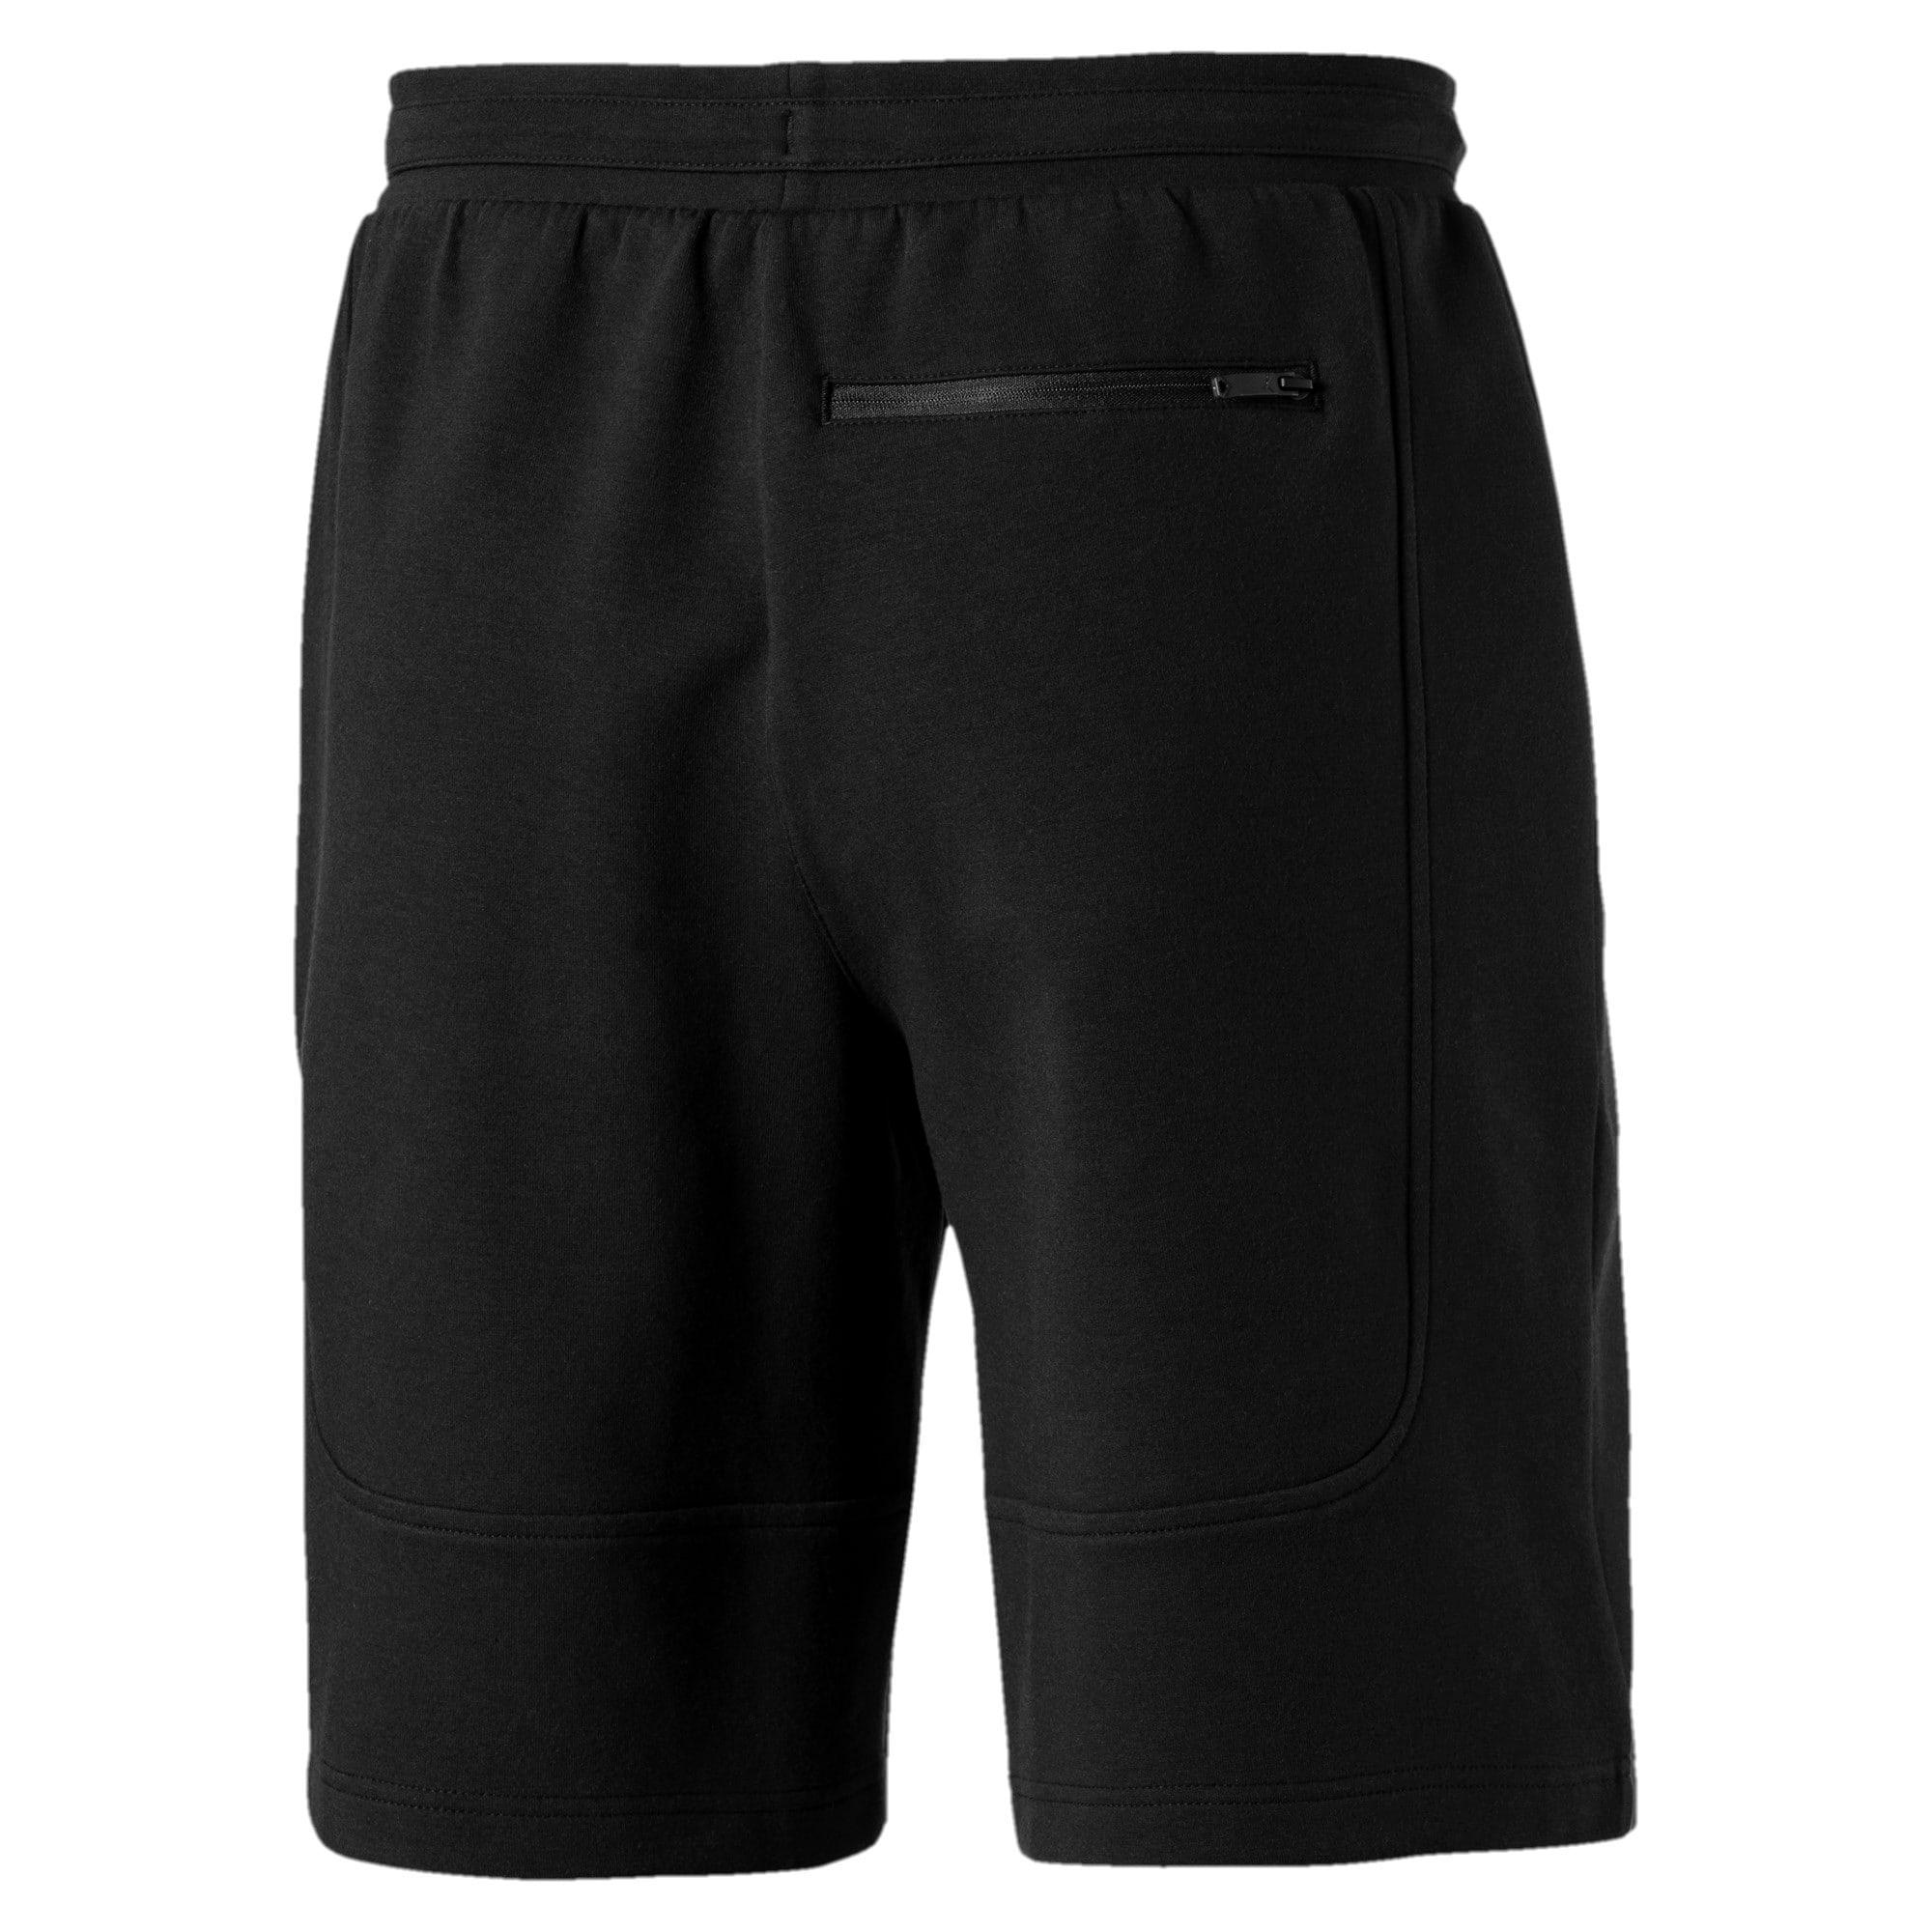 Thumbnail 3 of Ferrari Knitted Men's Shorts, Puma Black, medium-IND